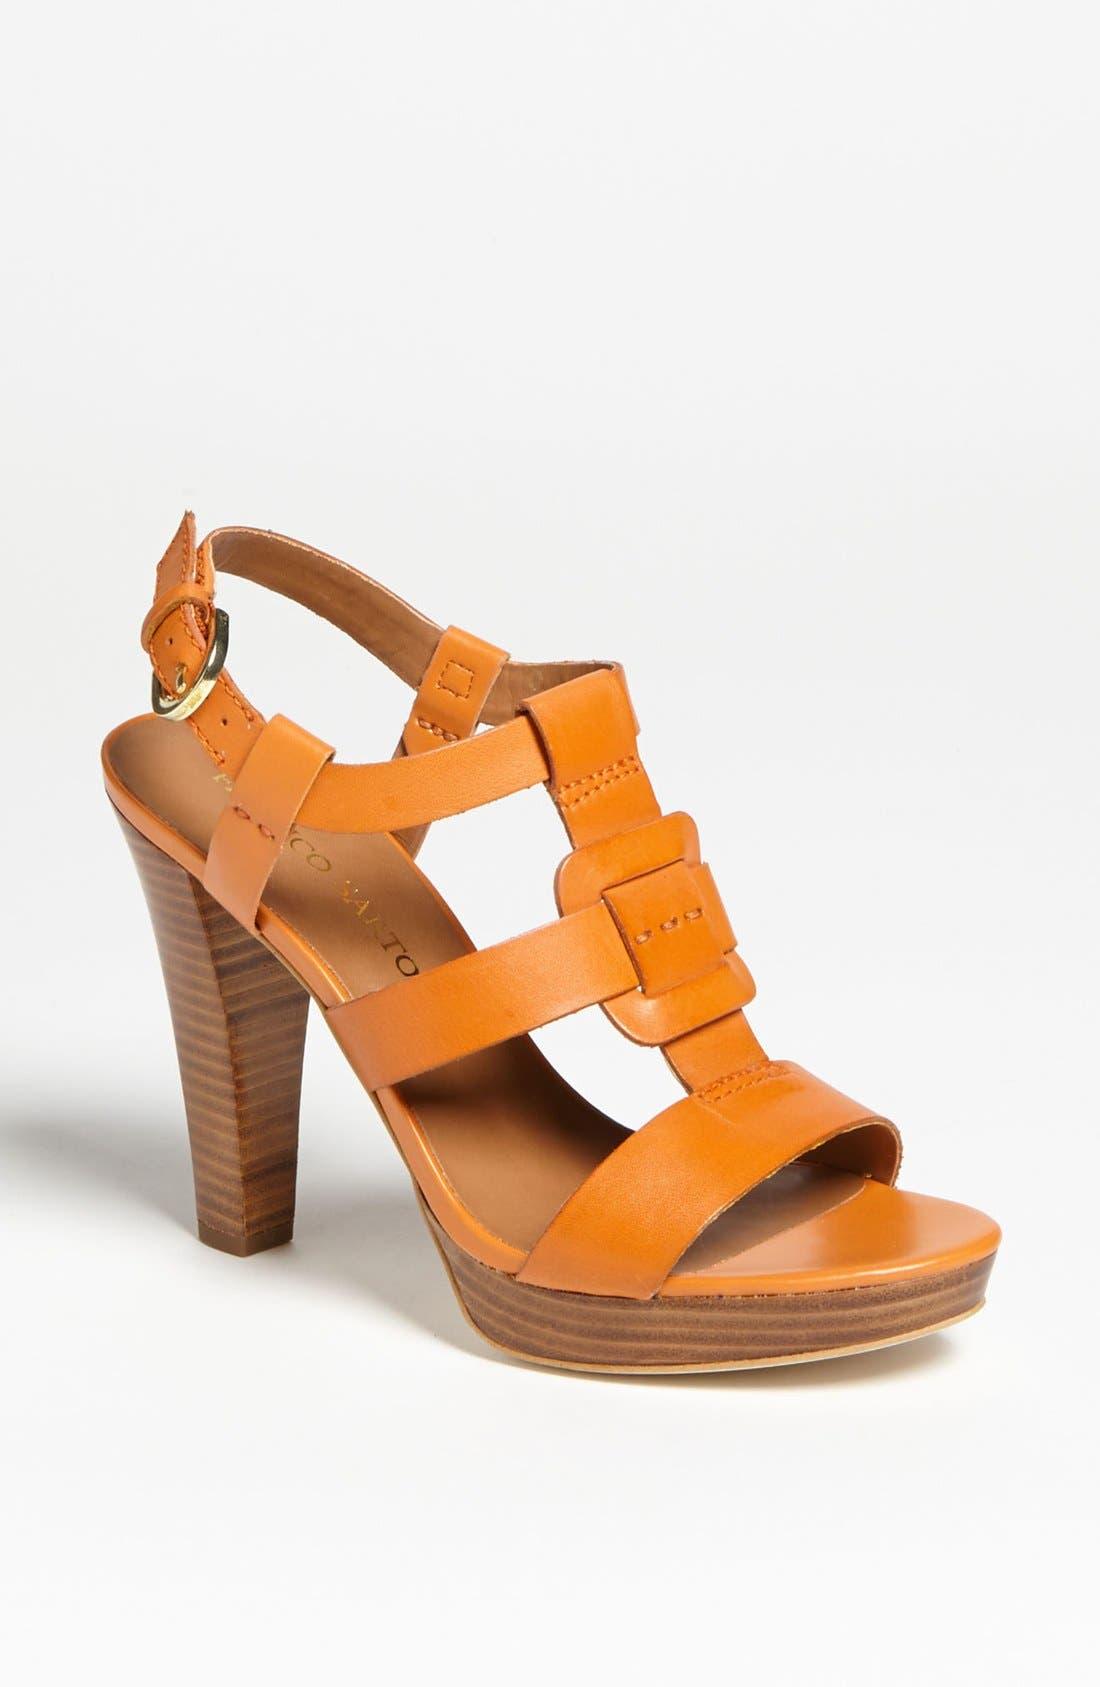 Main Image - Franco Sarto 'Betsy' Sandal